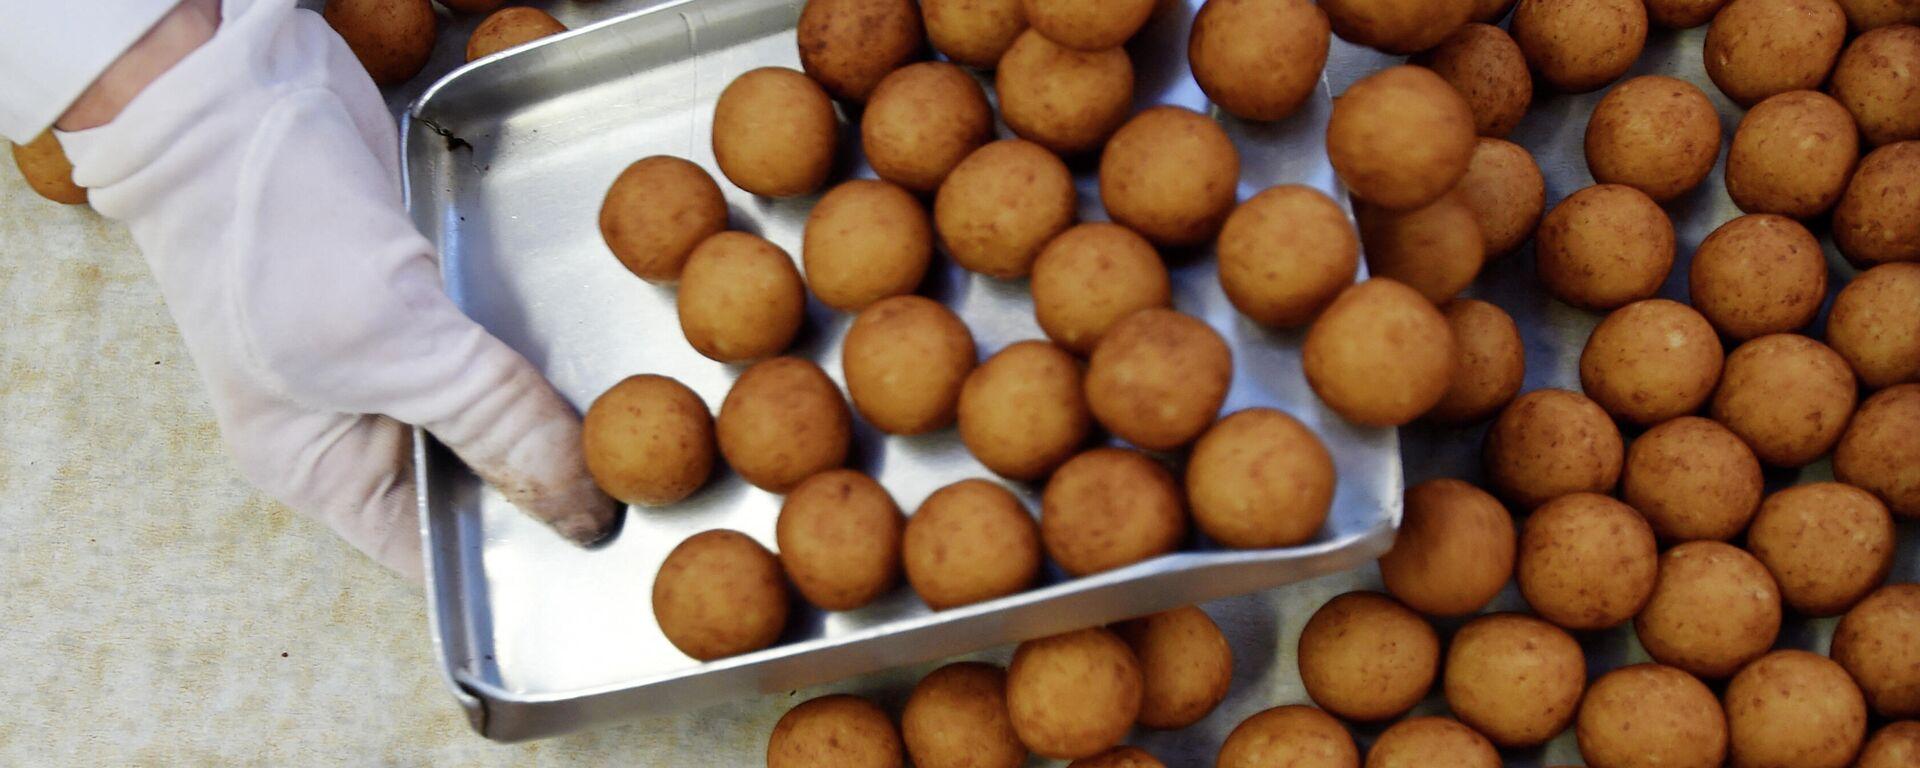 Kartoffeln (Symbolbild) - SNA, 1920, 17.03.2021